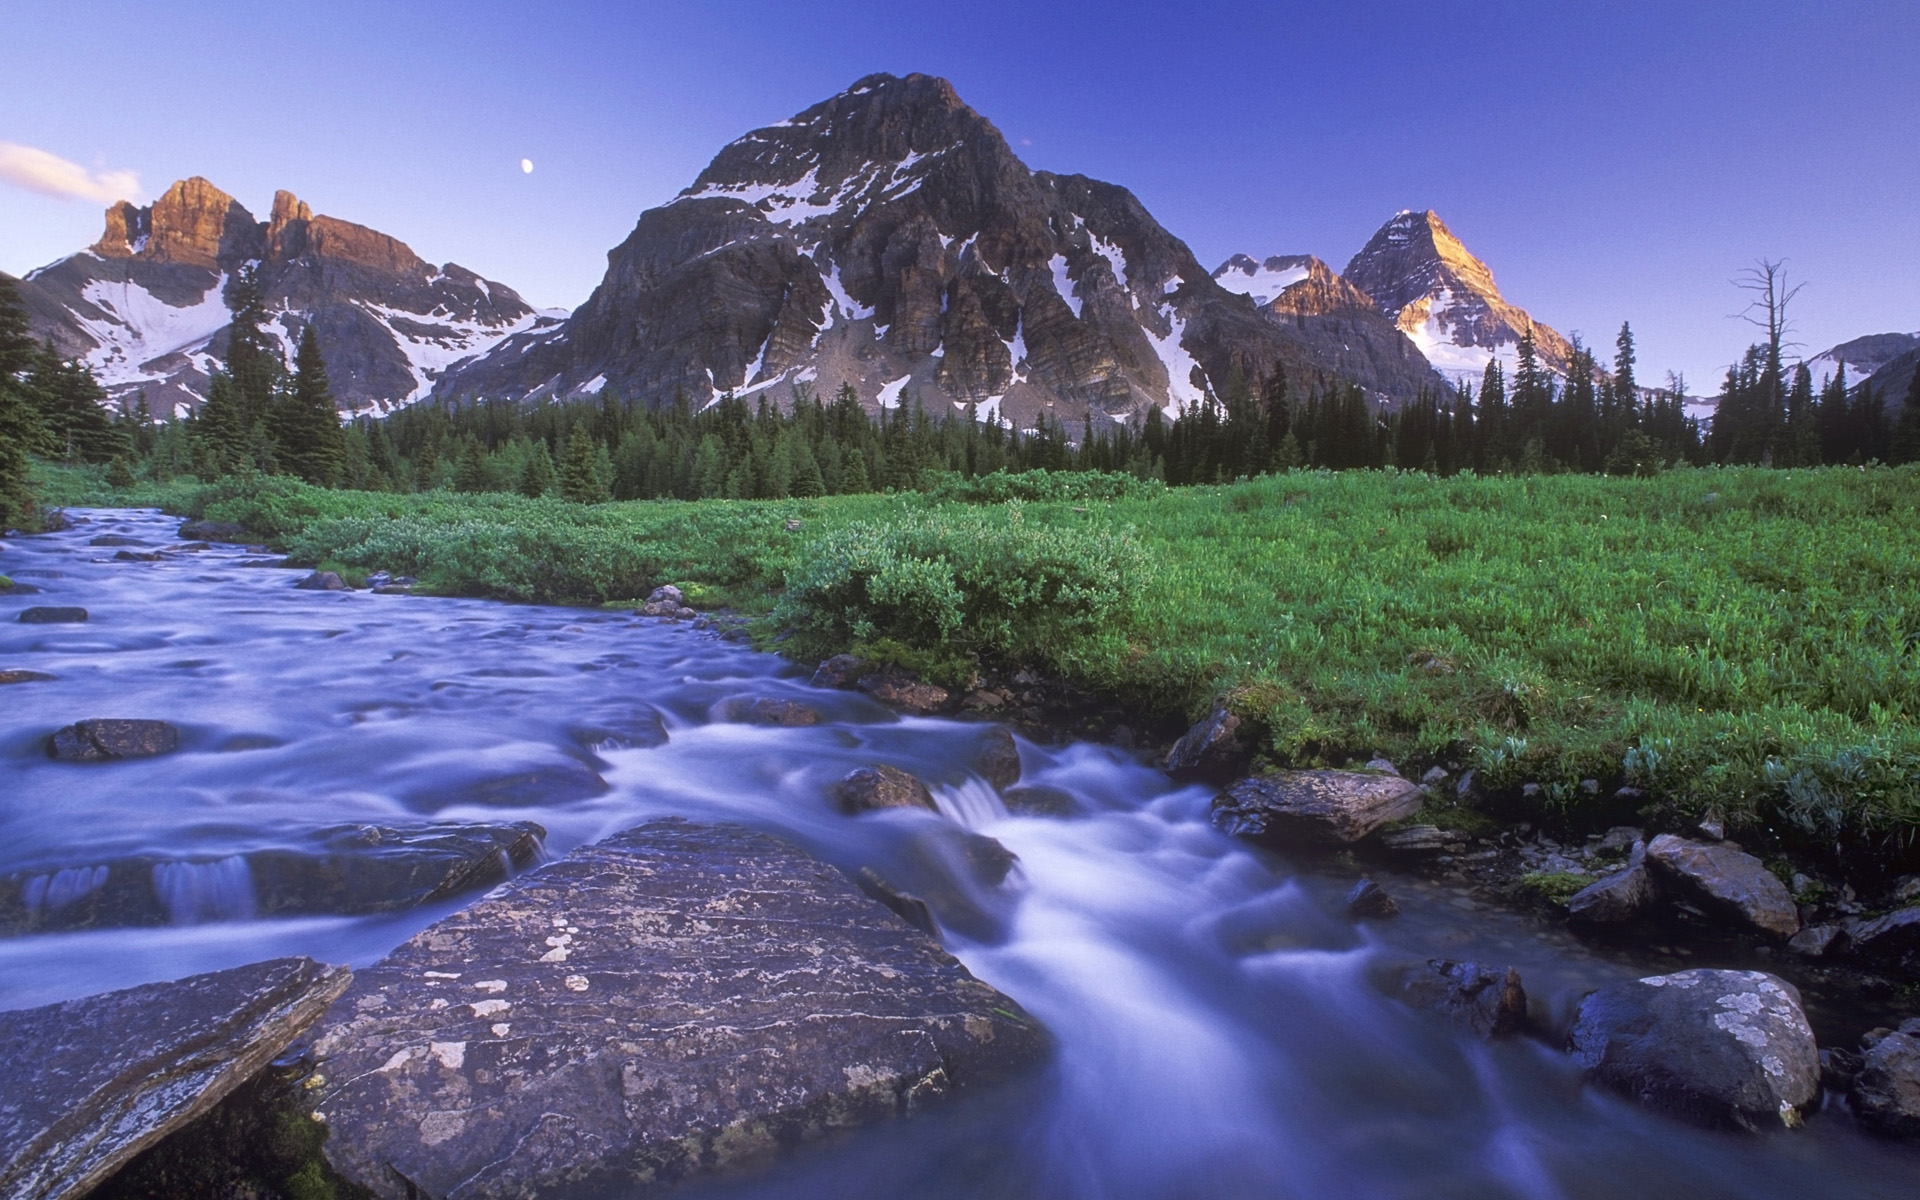 Magog Creek and Naiset Point Mount Assiniboine Provincial ParkAnse 1920x1200